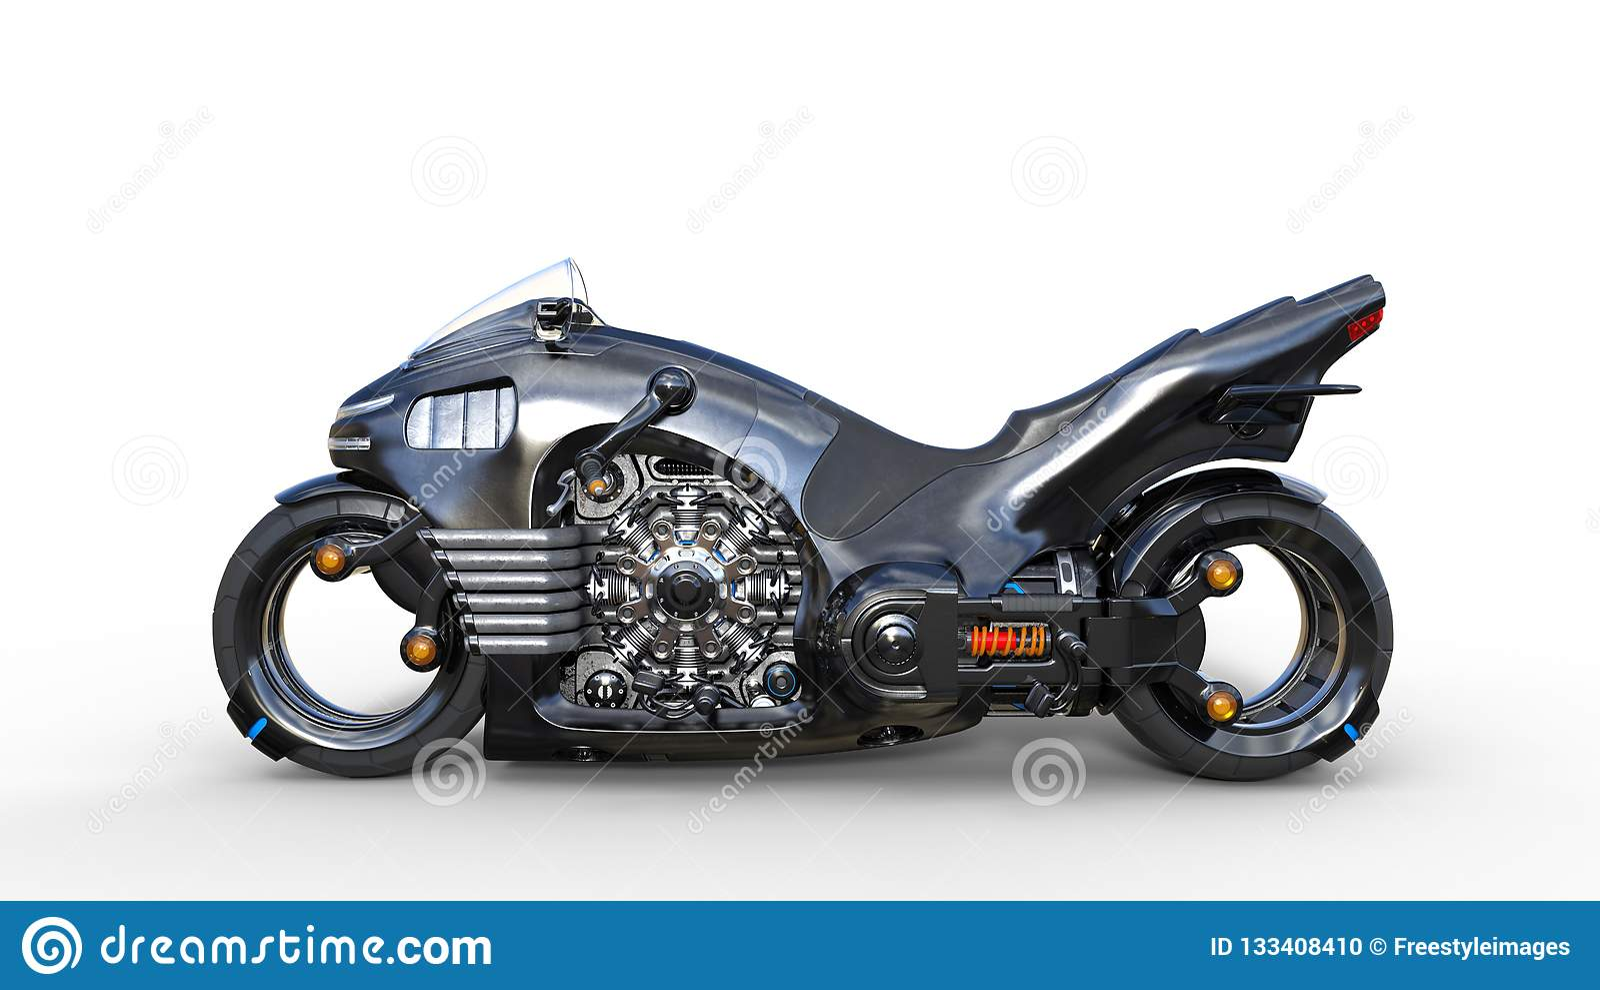 Bike With Chrome Engine, Black Futuristic Motorcycle